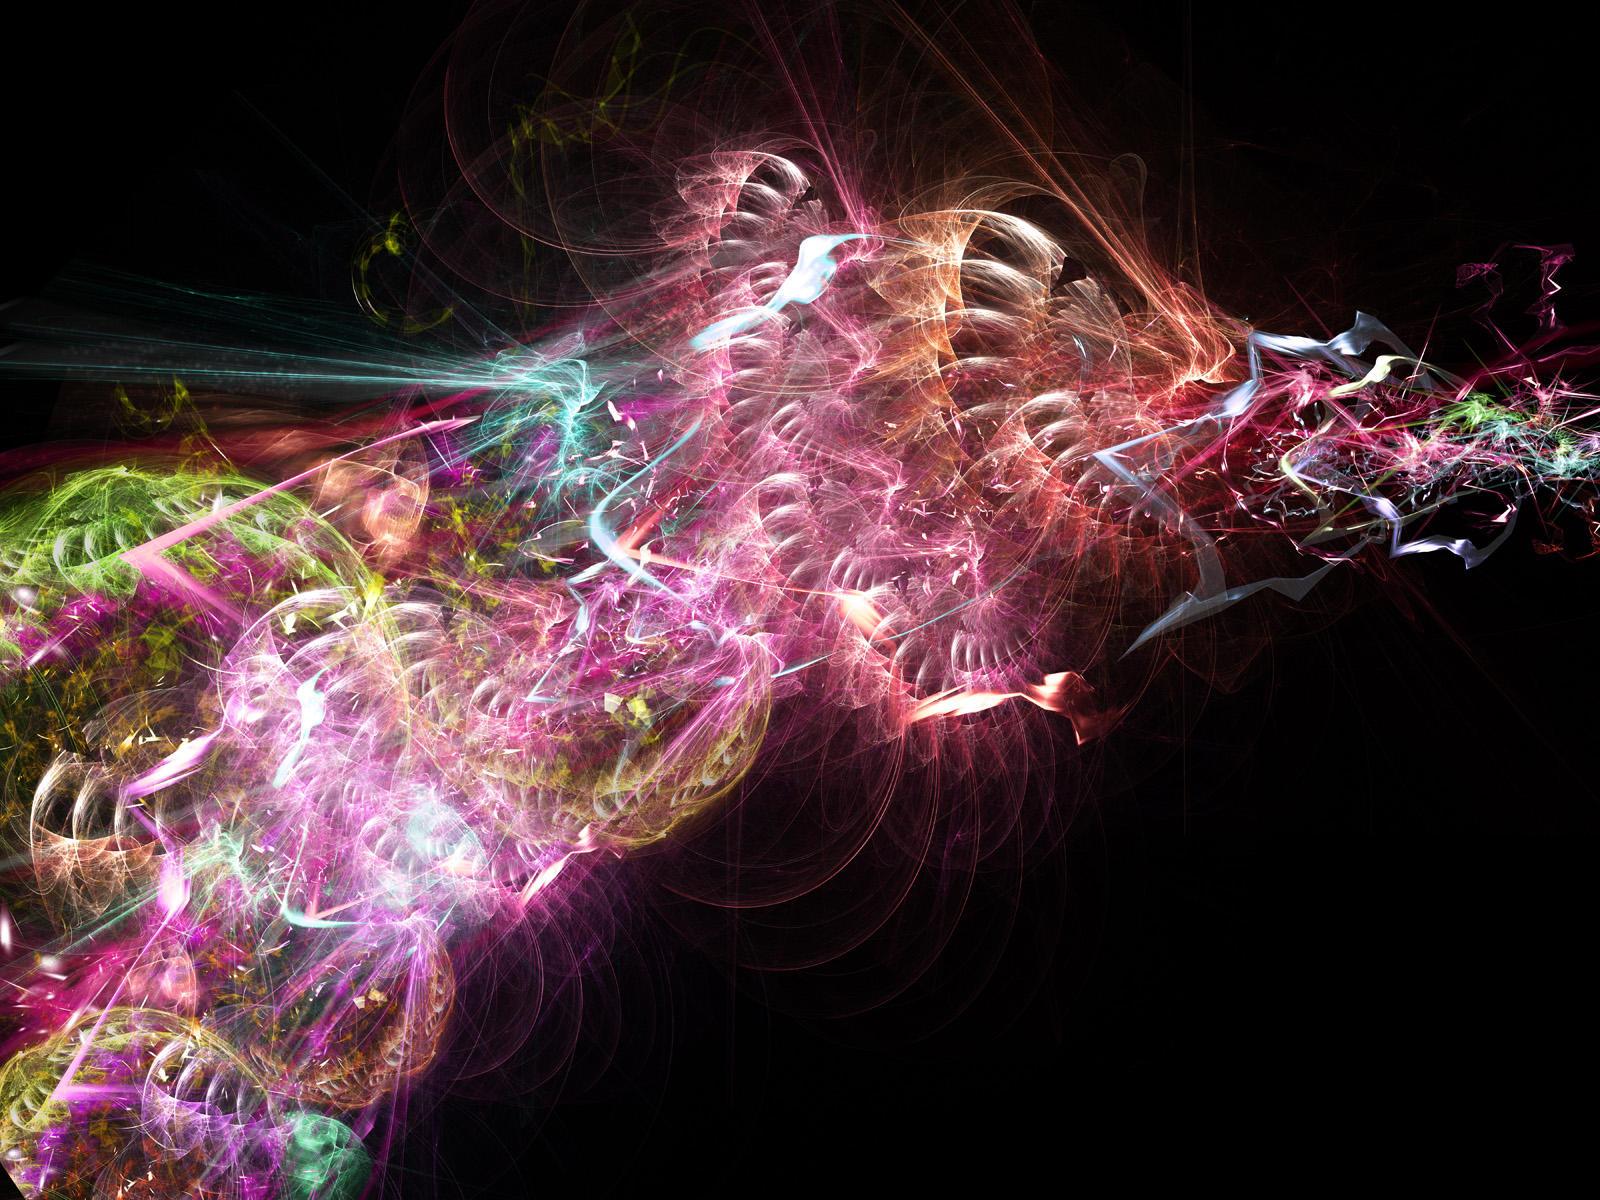 http://fc08.deviantart.net/fs11/i/2006/200/a/0/A_Lovecracking_Bottleneck_by_smashmethod.jpg